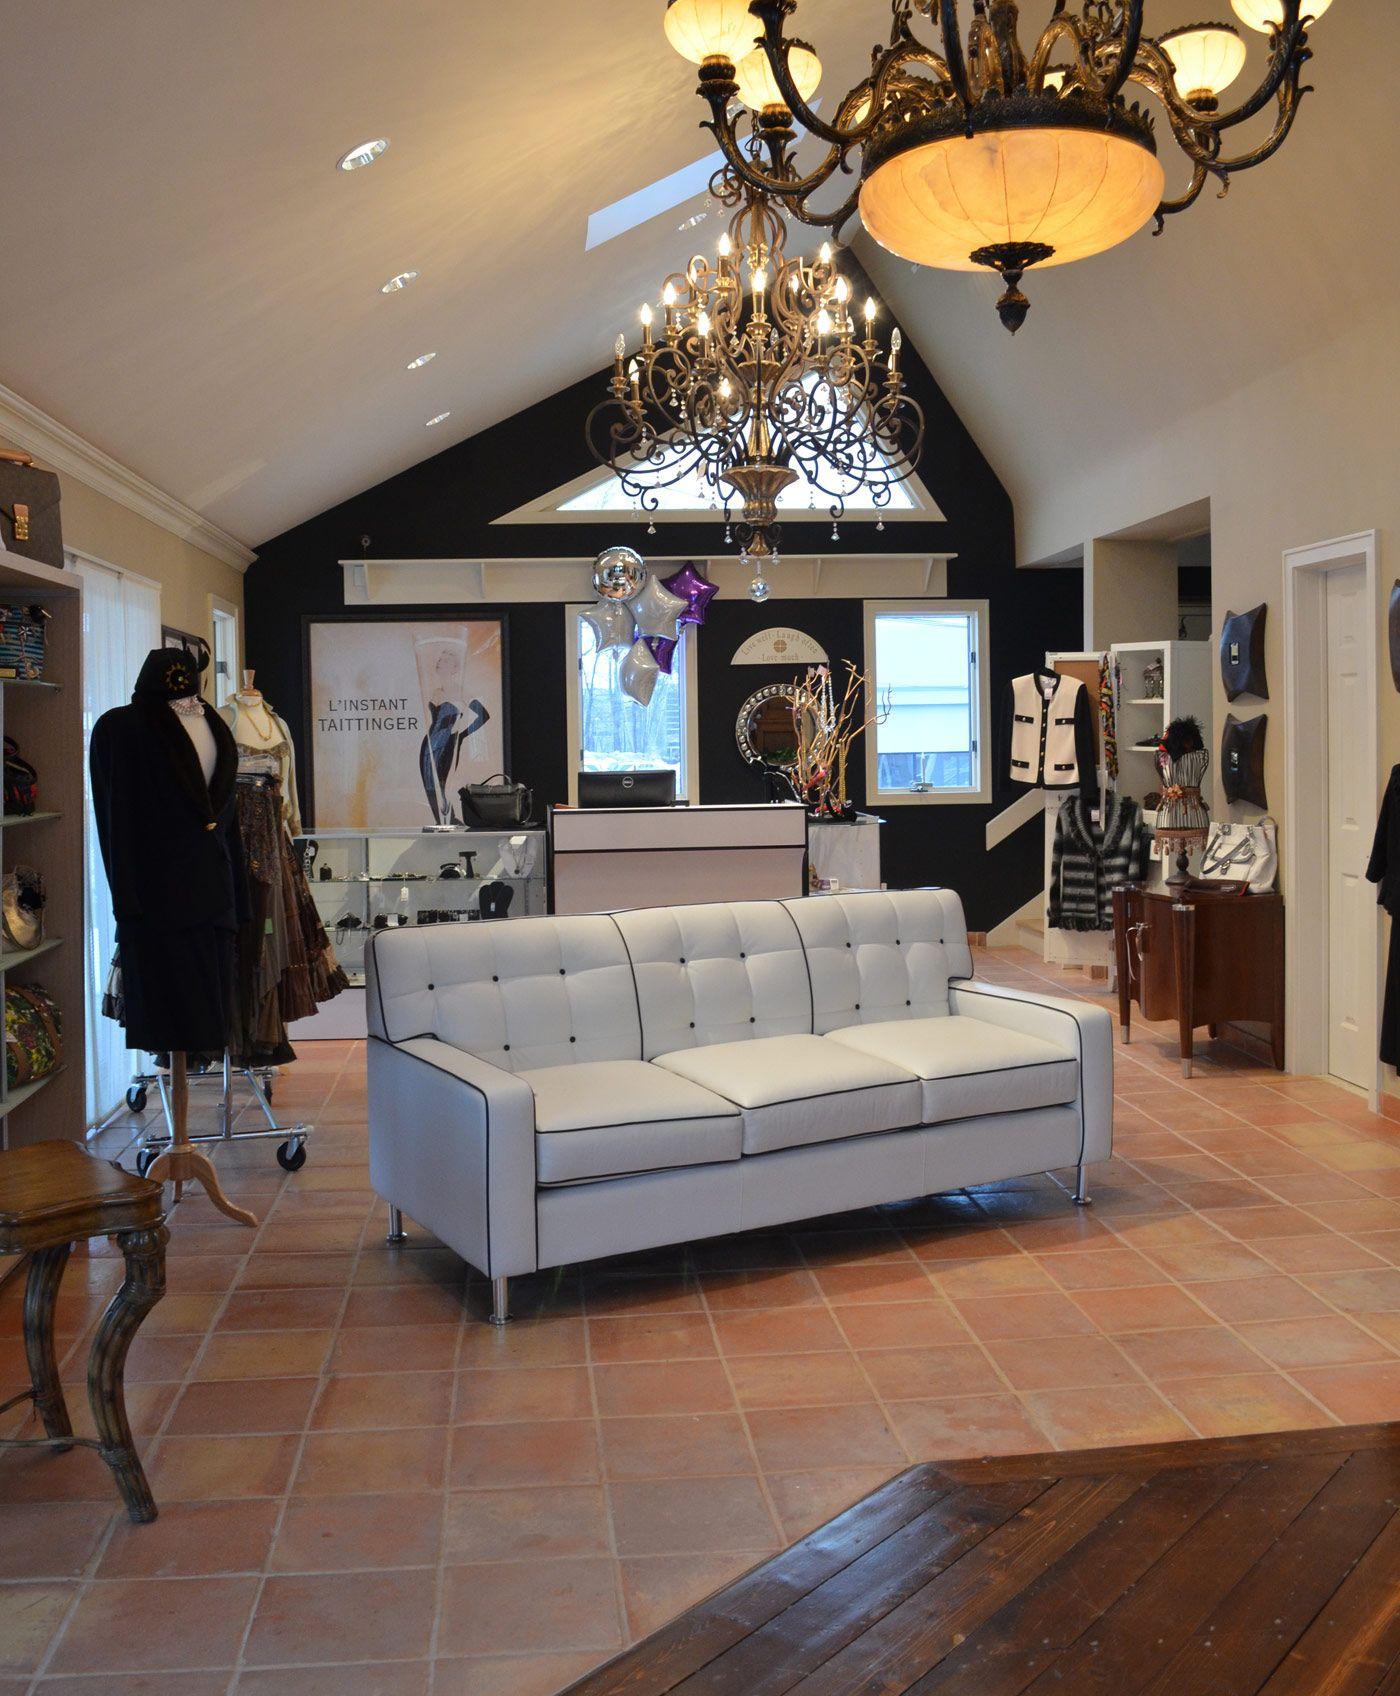 Design Consign Fairfield, NJ Online home design